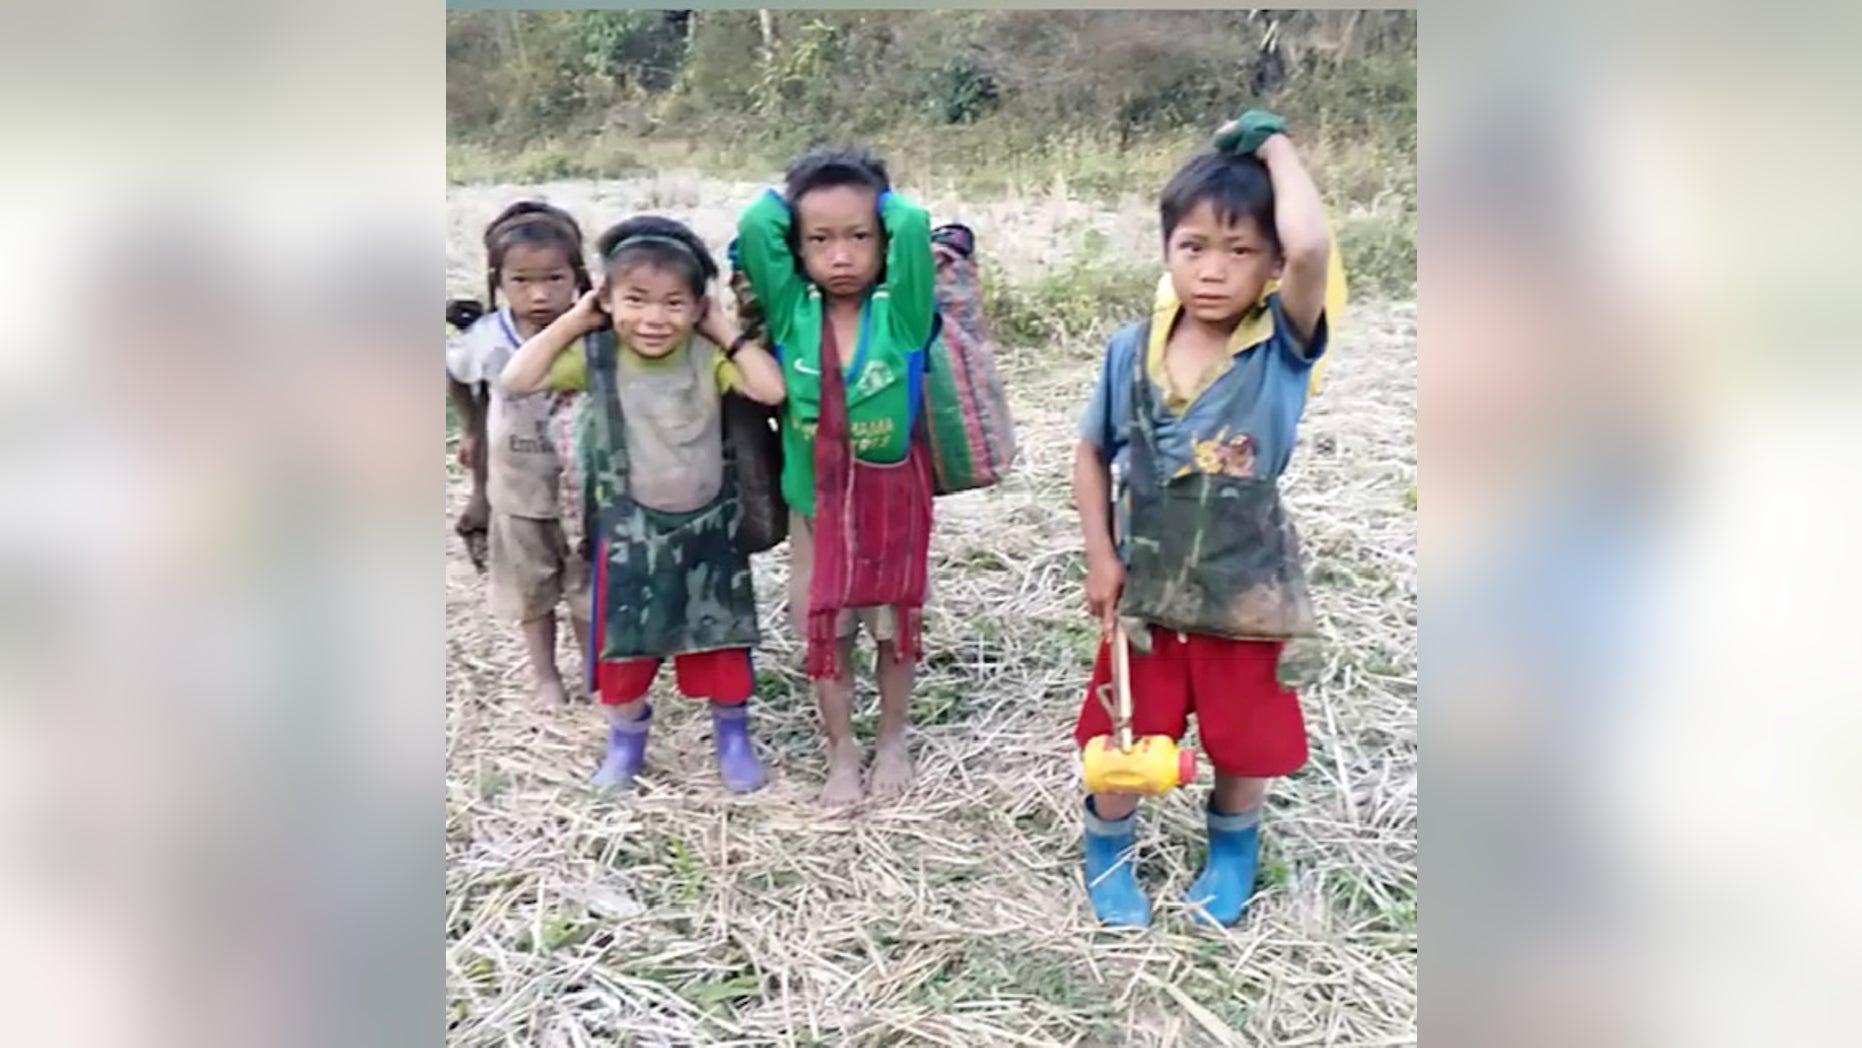 Karen children flee their homes in Burma on January 25, 2019